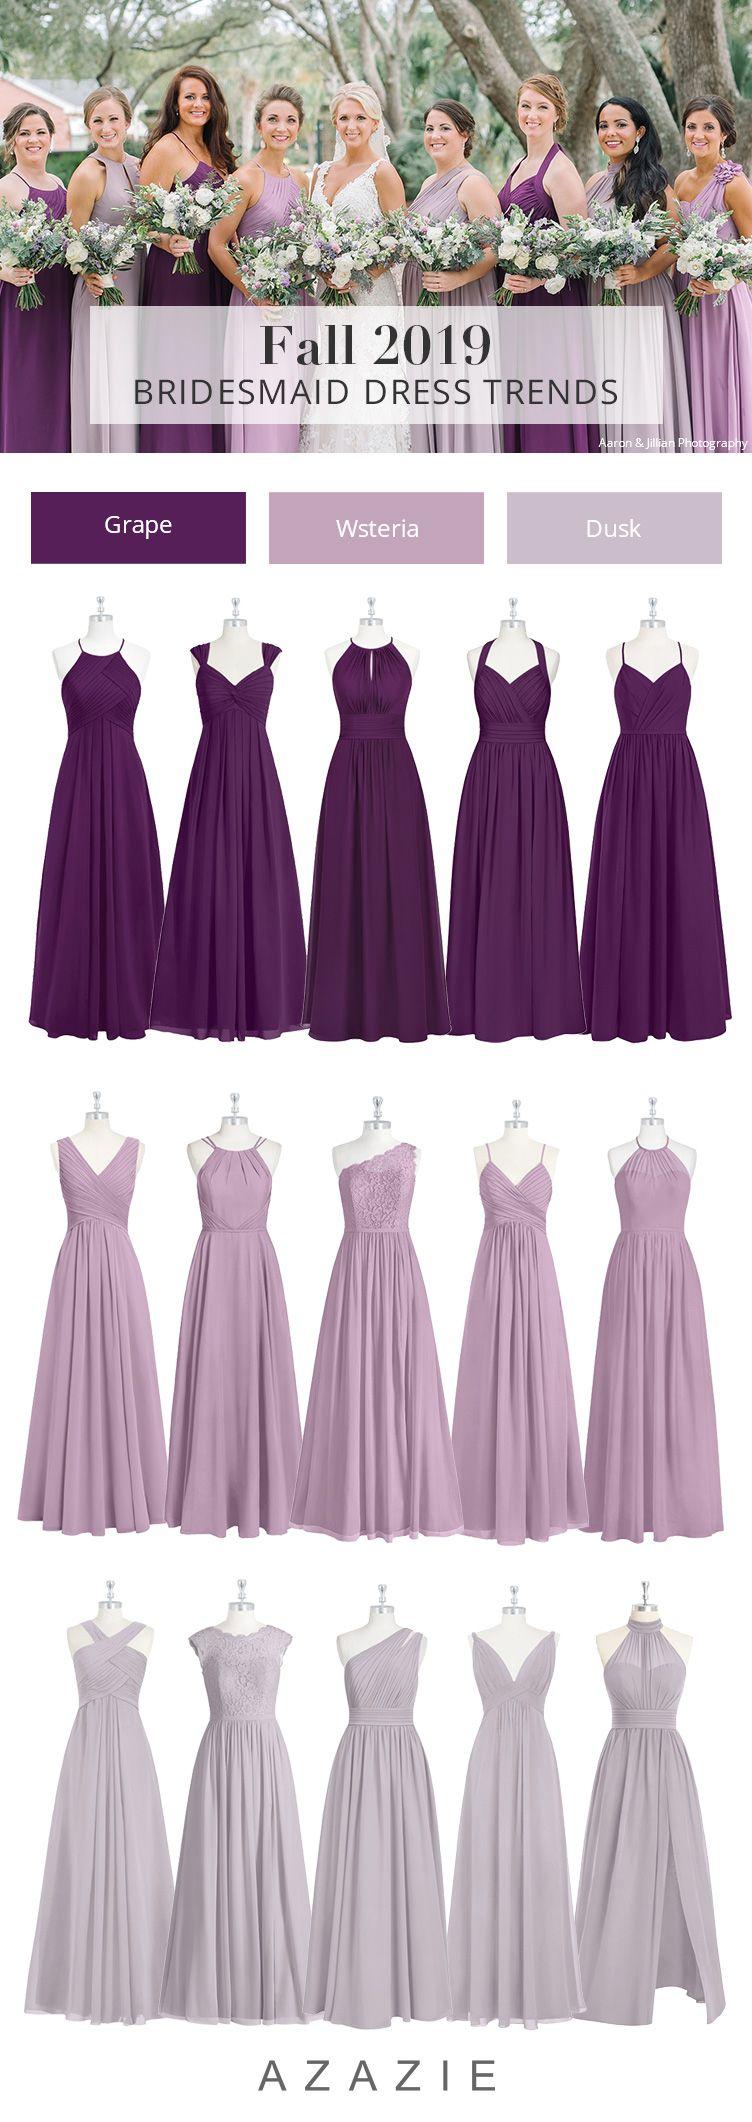 Azazie Purple Wedding Colors Purple Wedding Dress Purple Bridesmaid Dresses Wedding Colors Purple [ 2122 x 752 Pixel ]